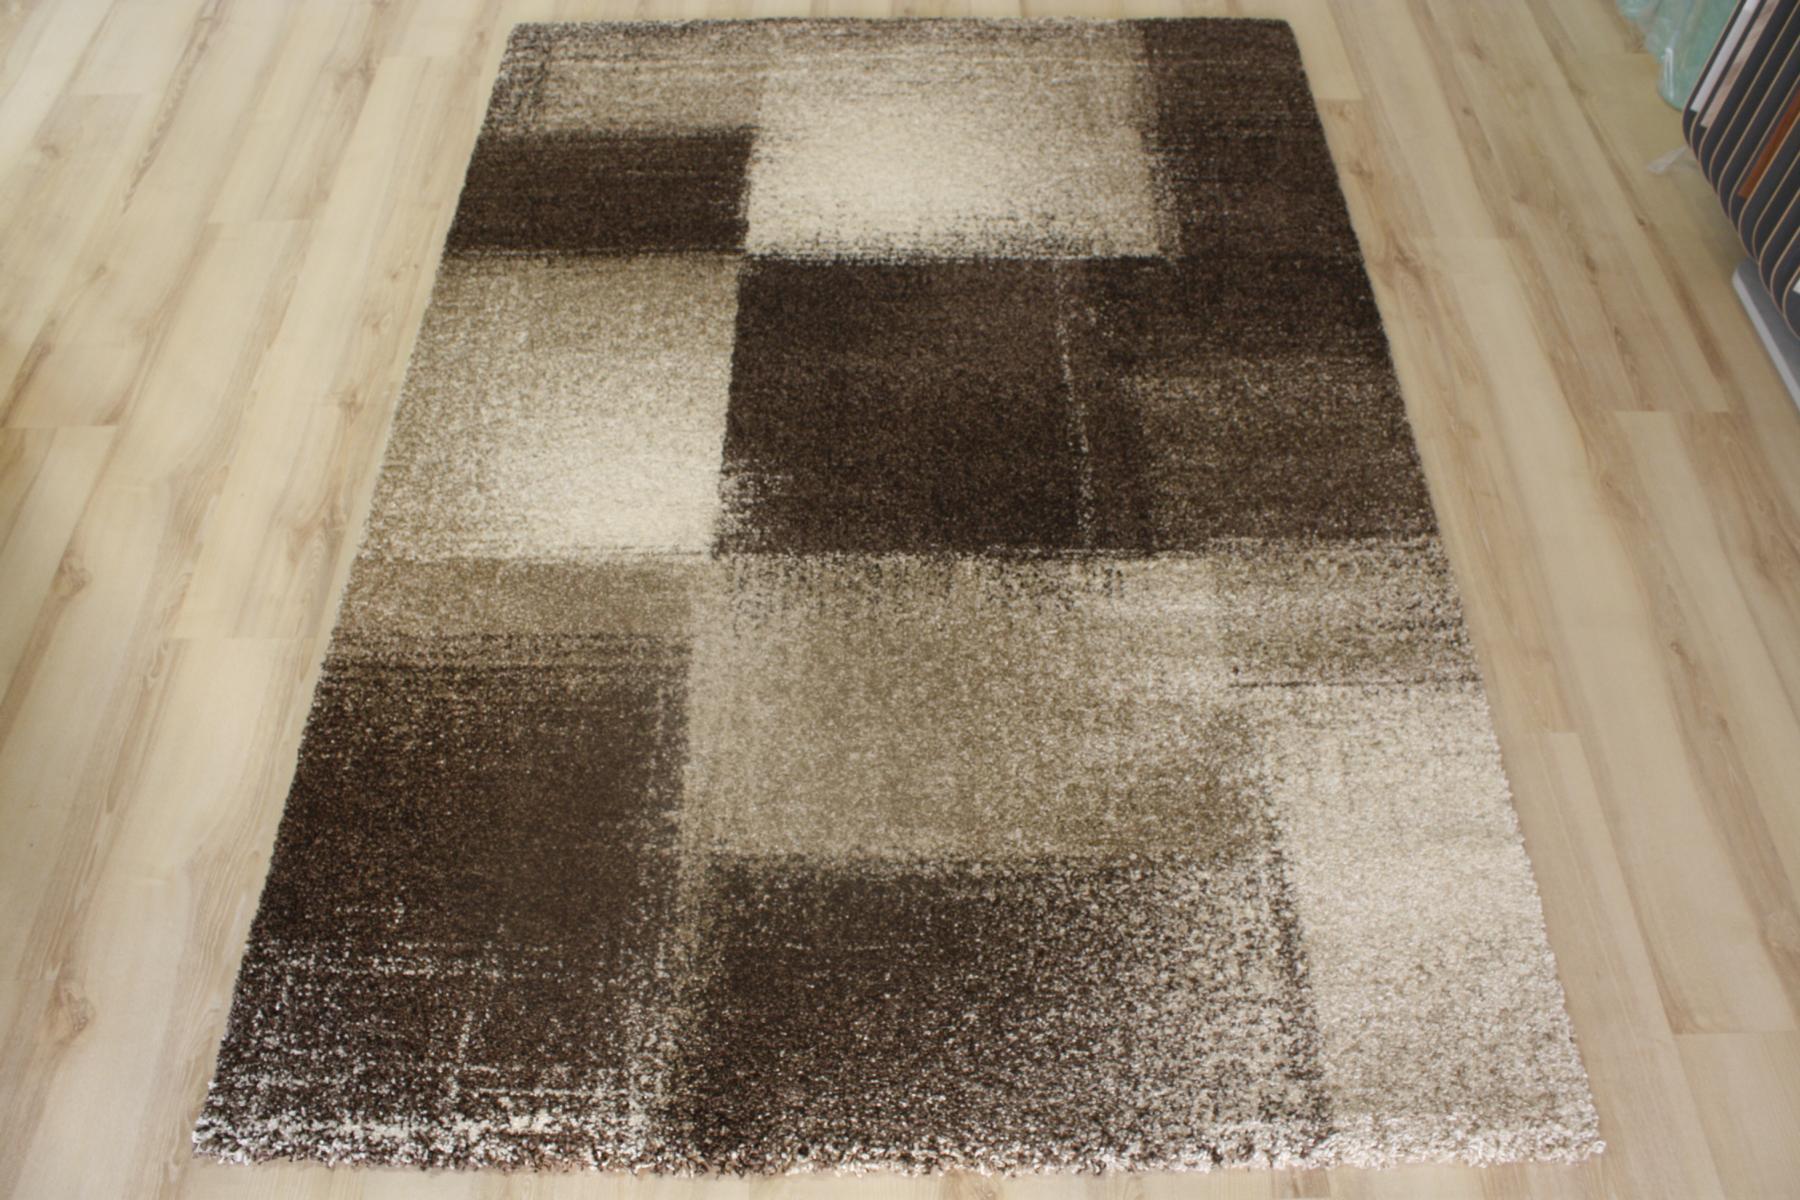 astra samoa teppich 6870 151 060 braun 140x200cm neu ebay. Black Bedroom Furniture Sets. Home Design Ideas